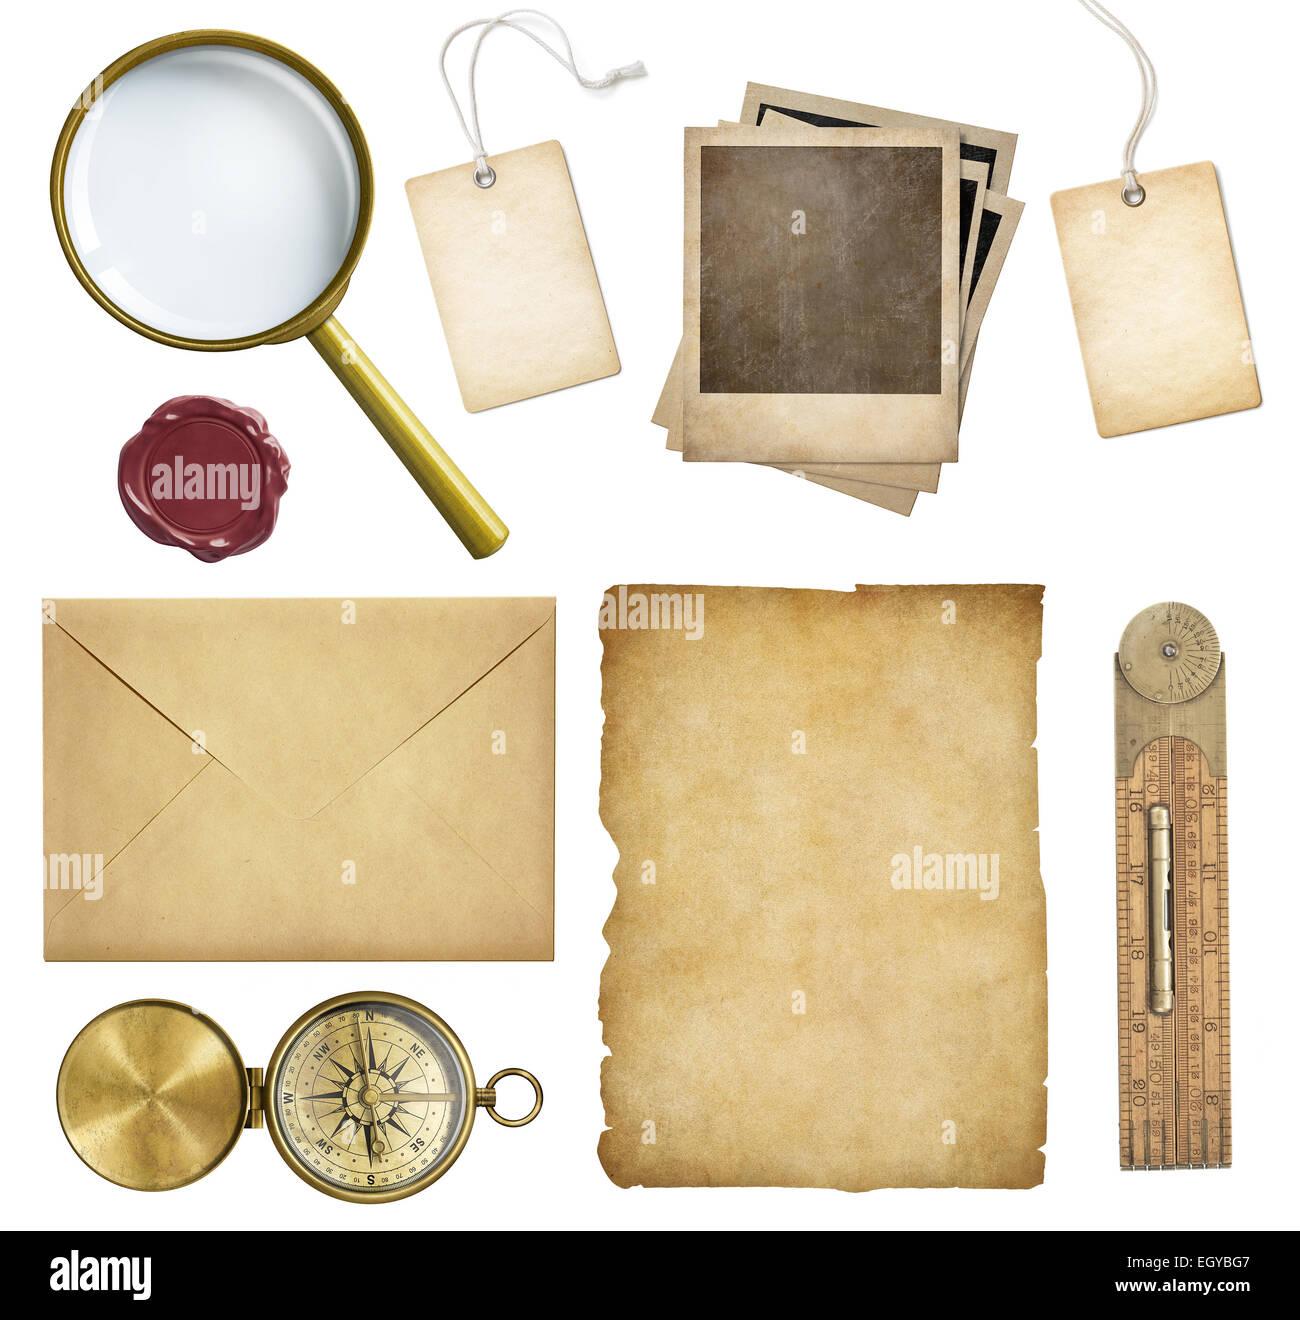 Compass Card Stockfotos & Compass Card Bilder - Alamy